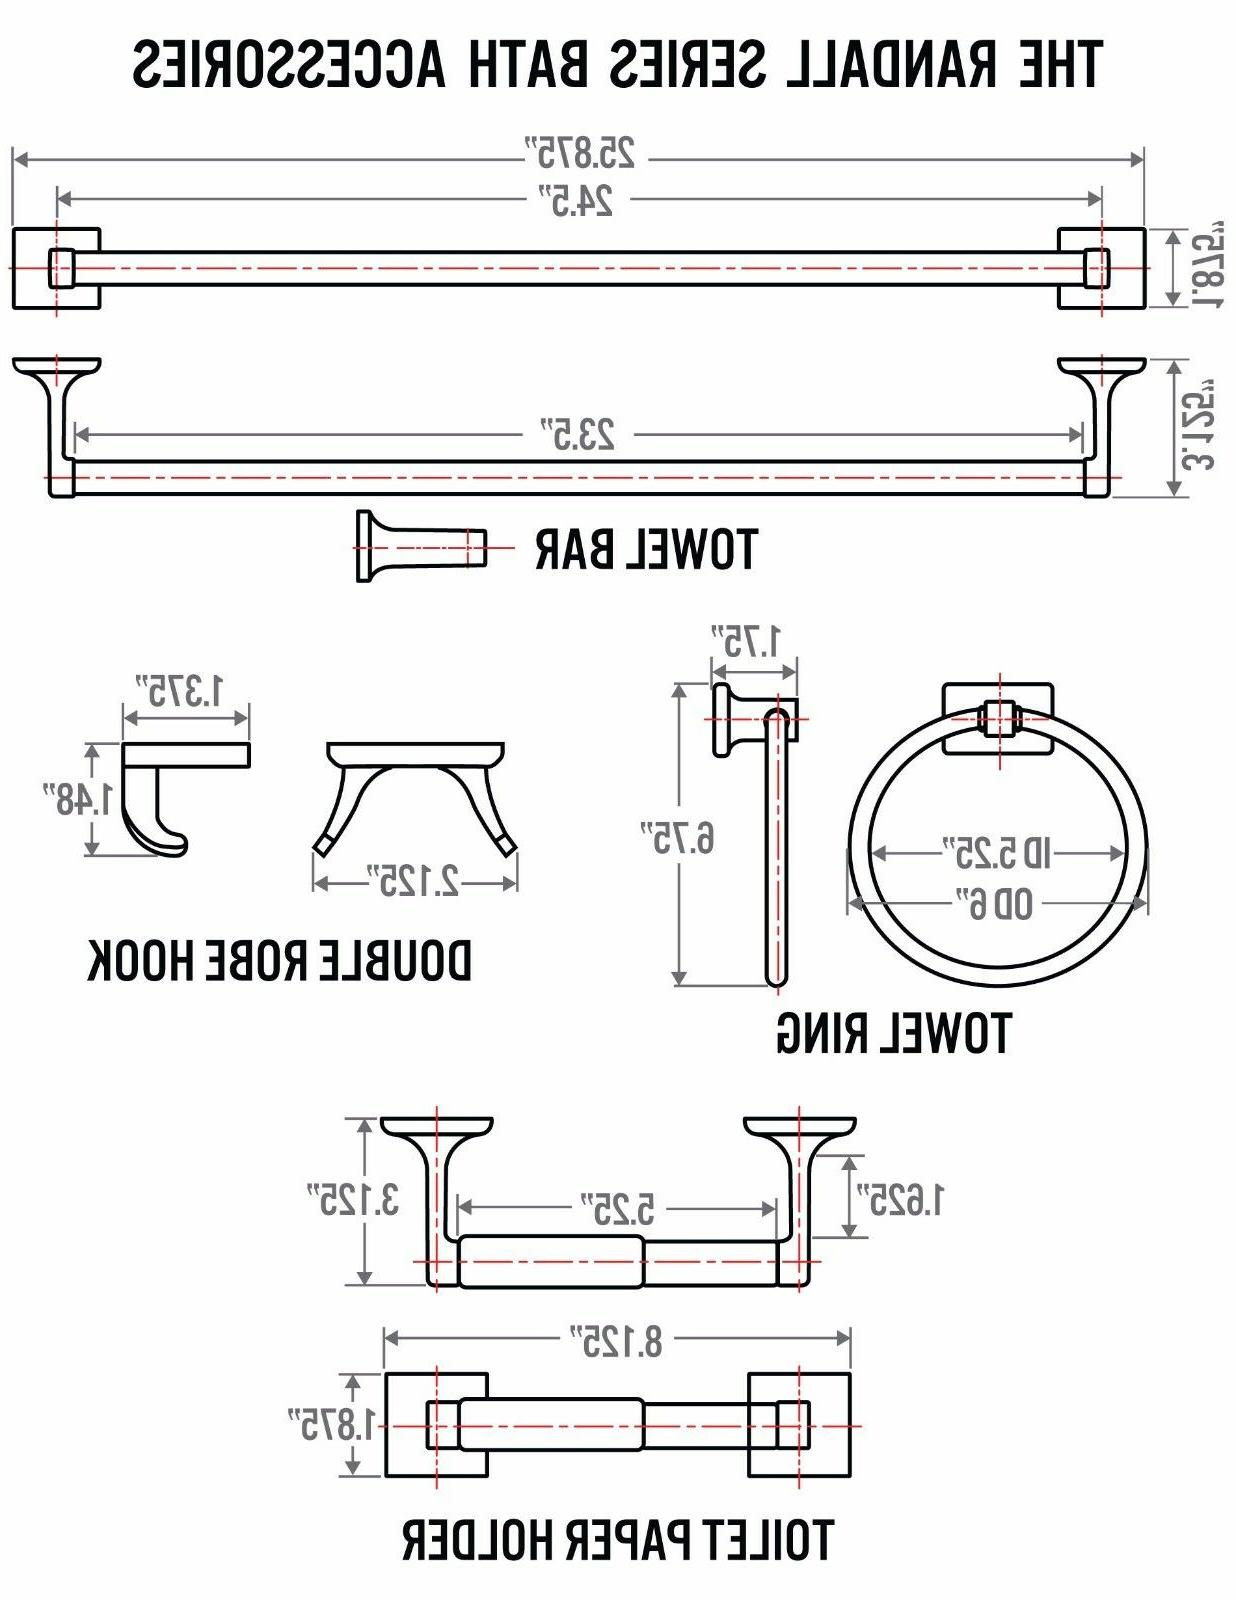 4 Set Hardware -